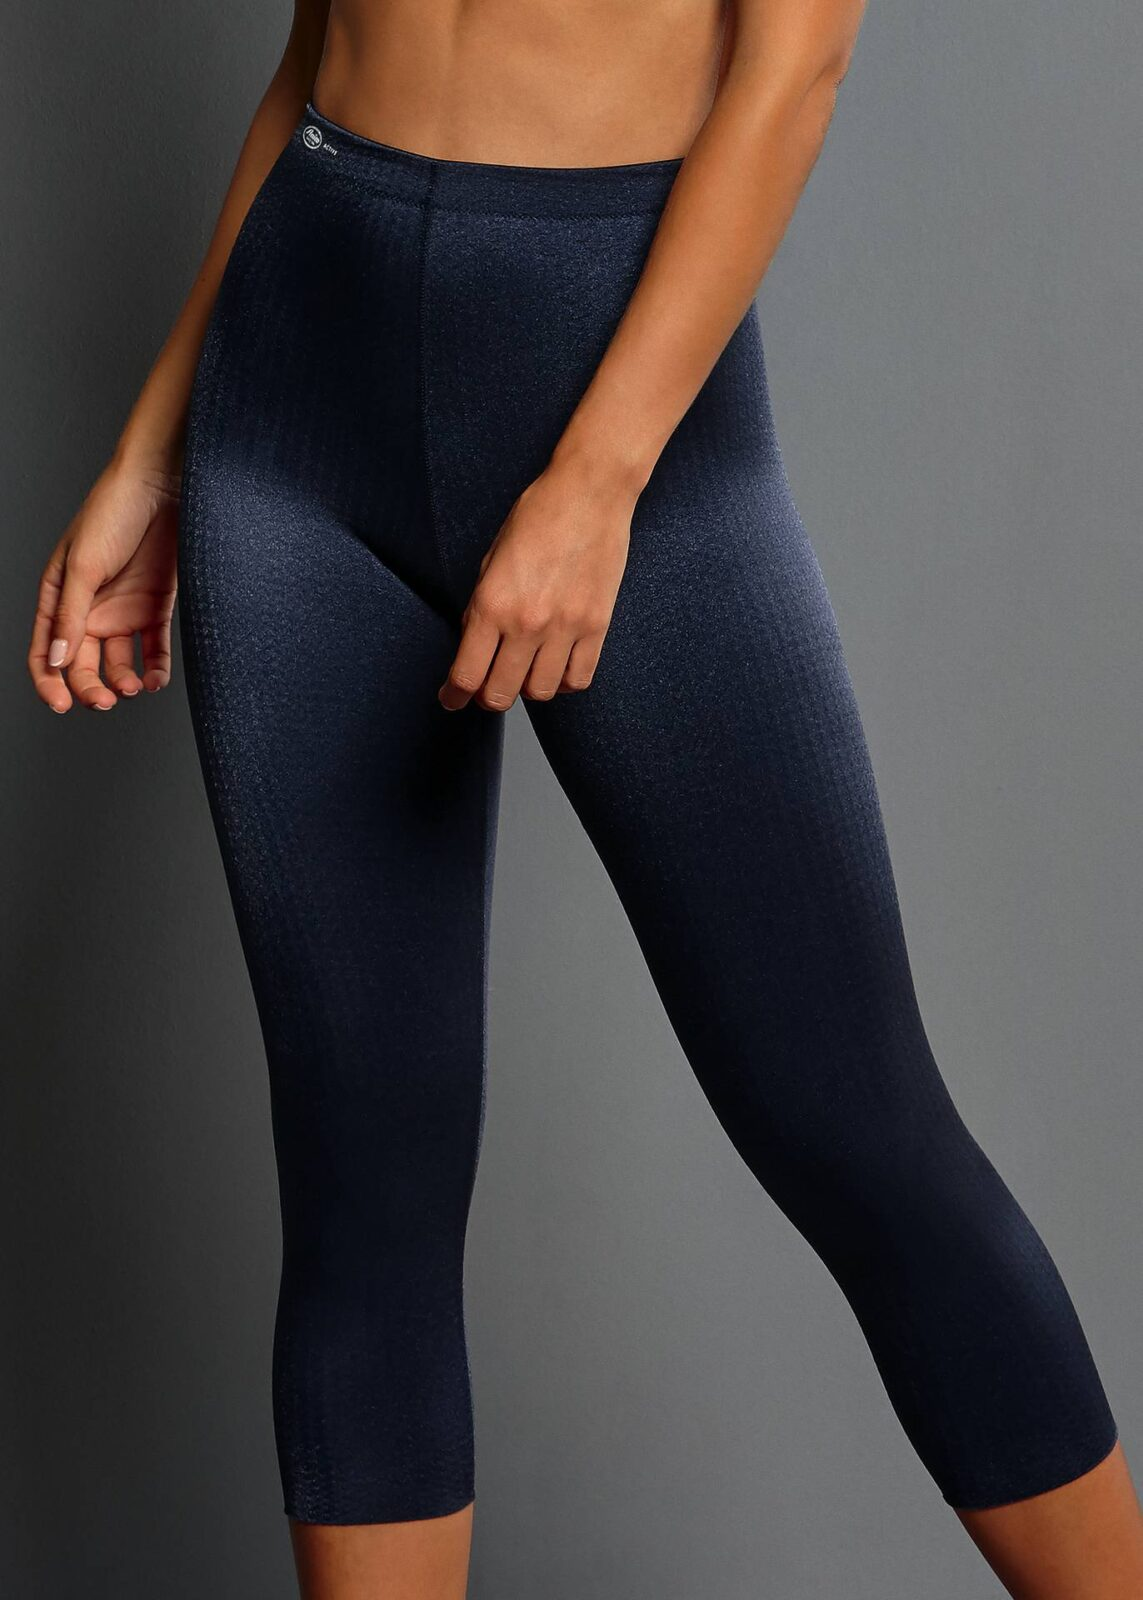 Anita sports tights